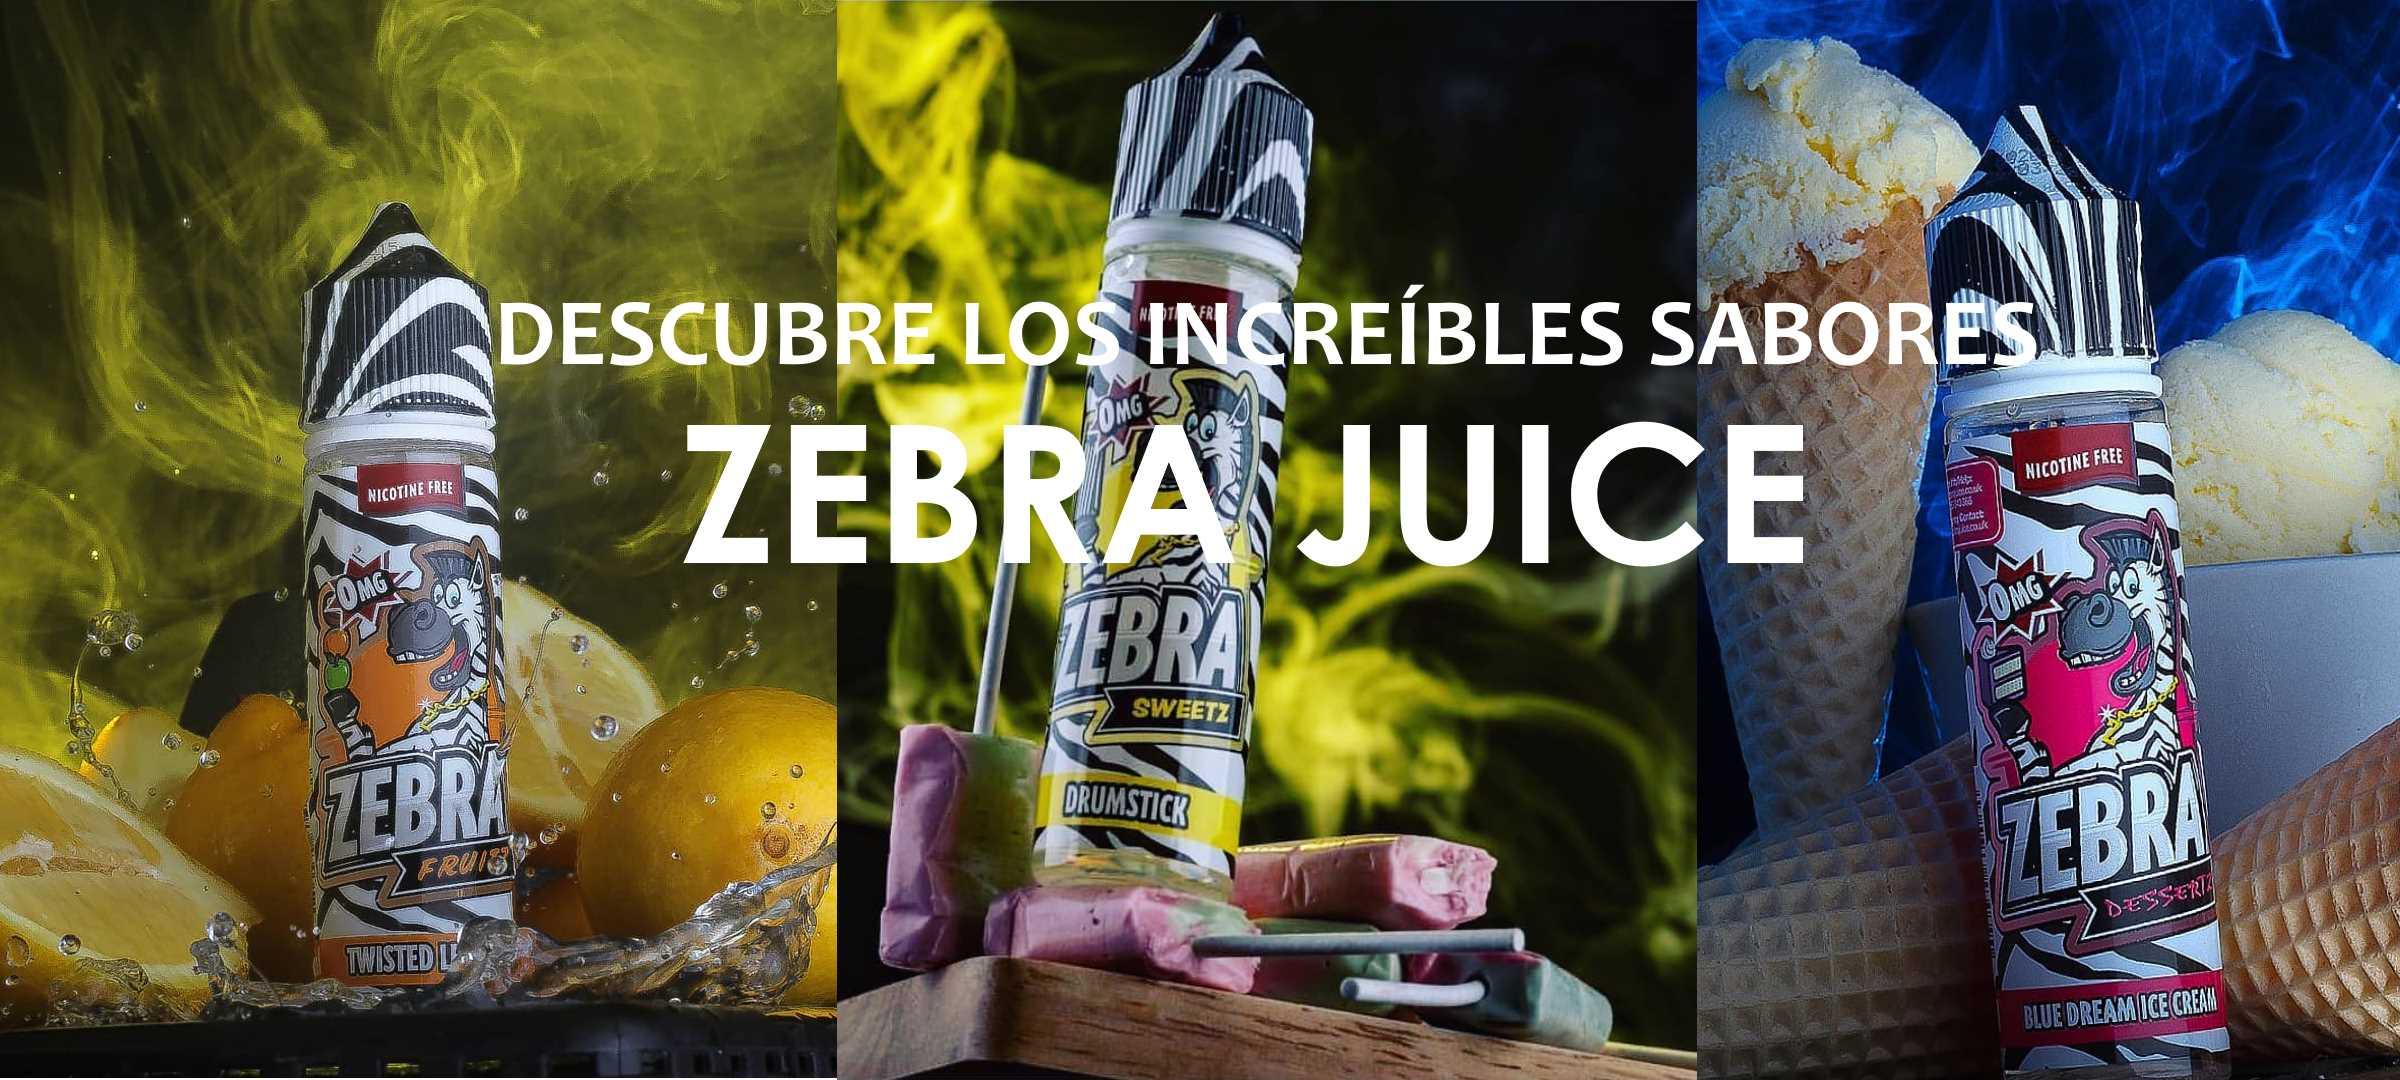 Zebra Juice Tienda de E-Liquids 2019